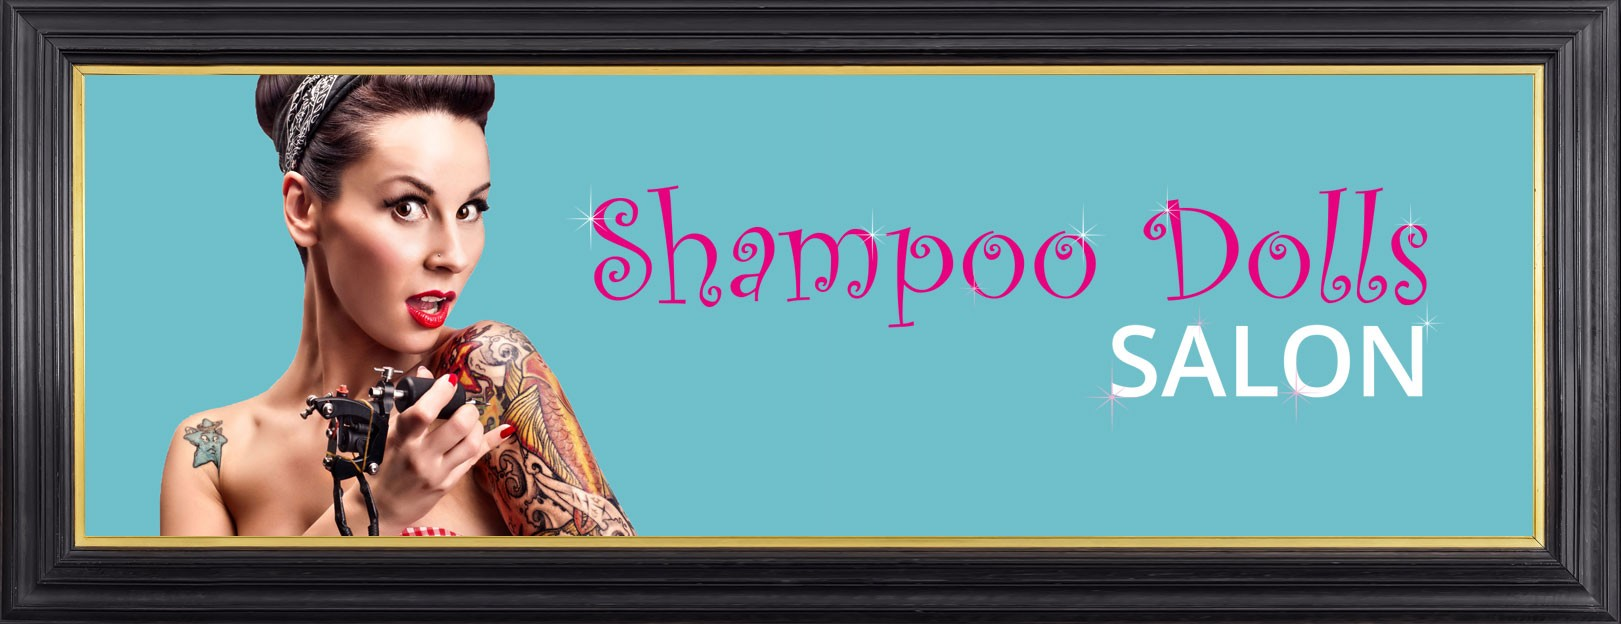 shampoo dolls hair cottage grove, shampoo dolls staff in cottage grove Oregon, best hair styling in cottage grove, shampoo dolls salon, best salon in cottage grove Oregon